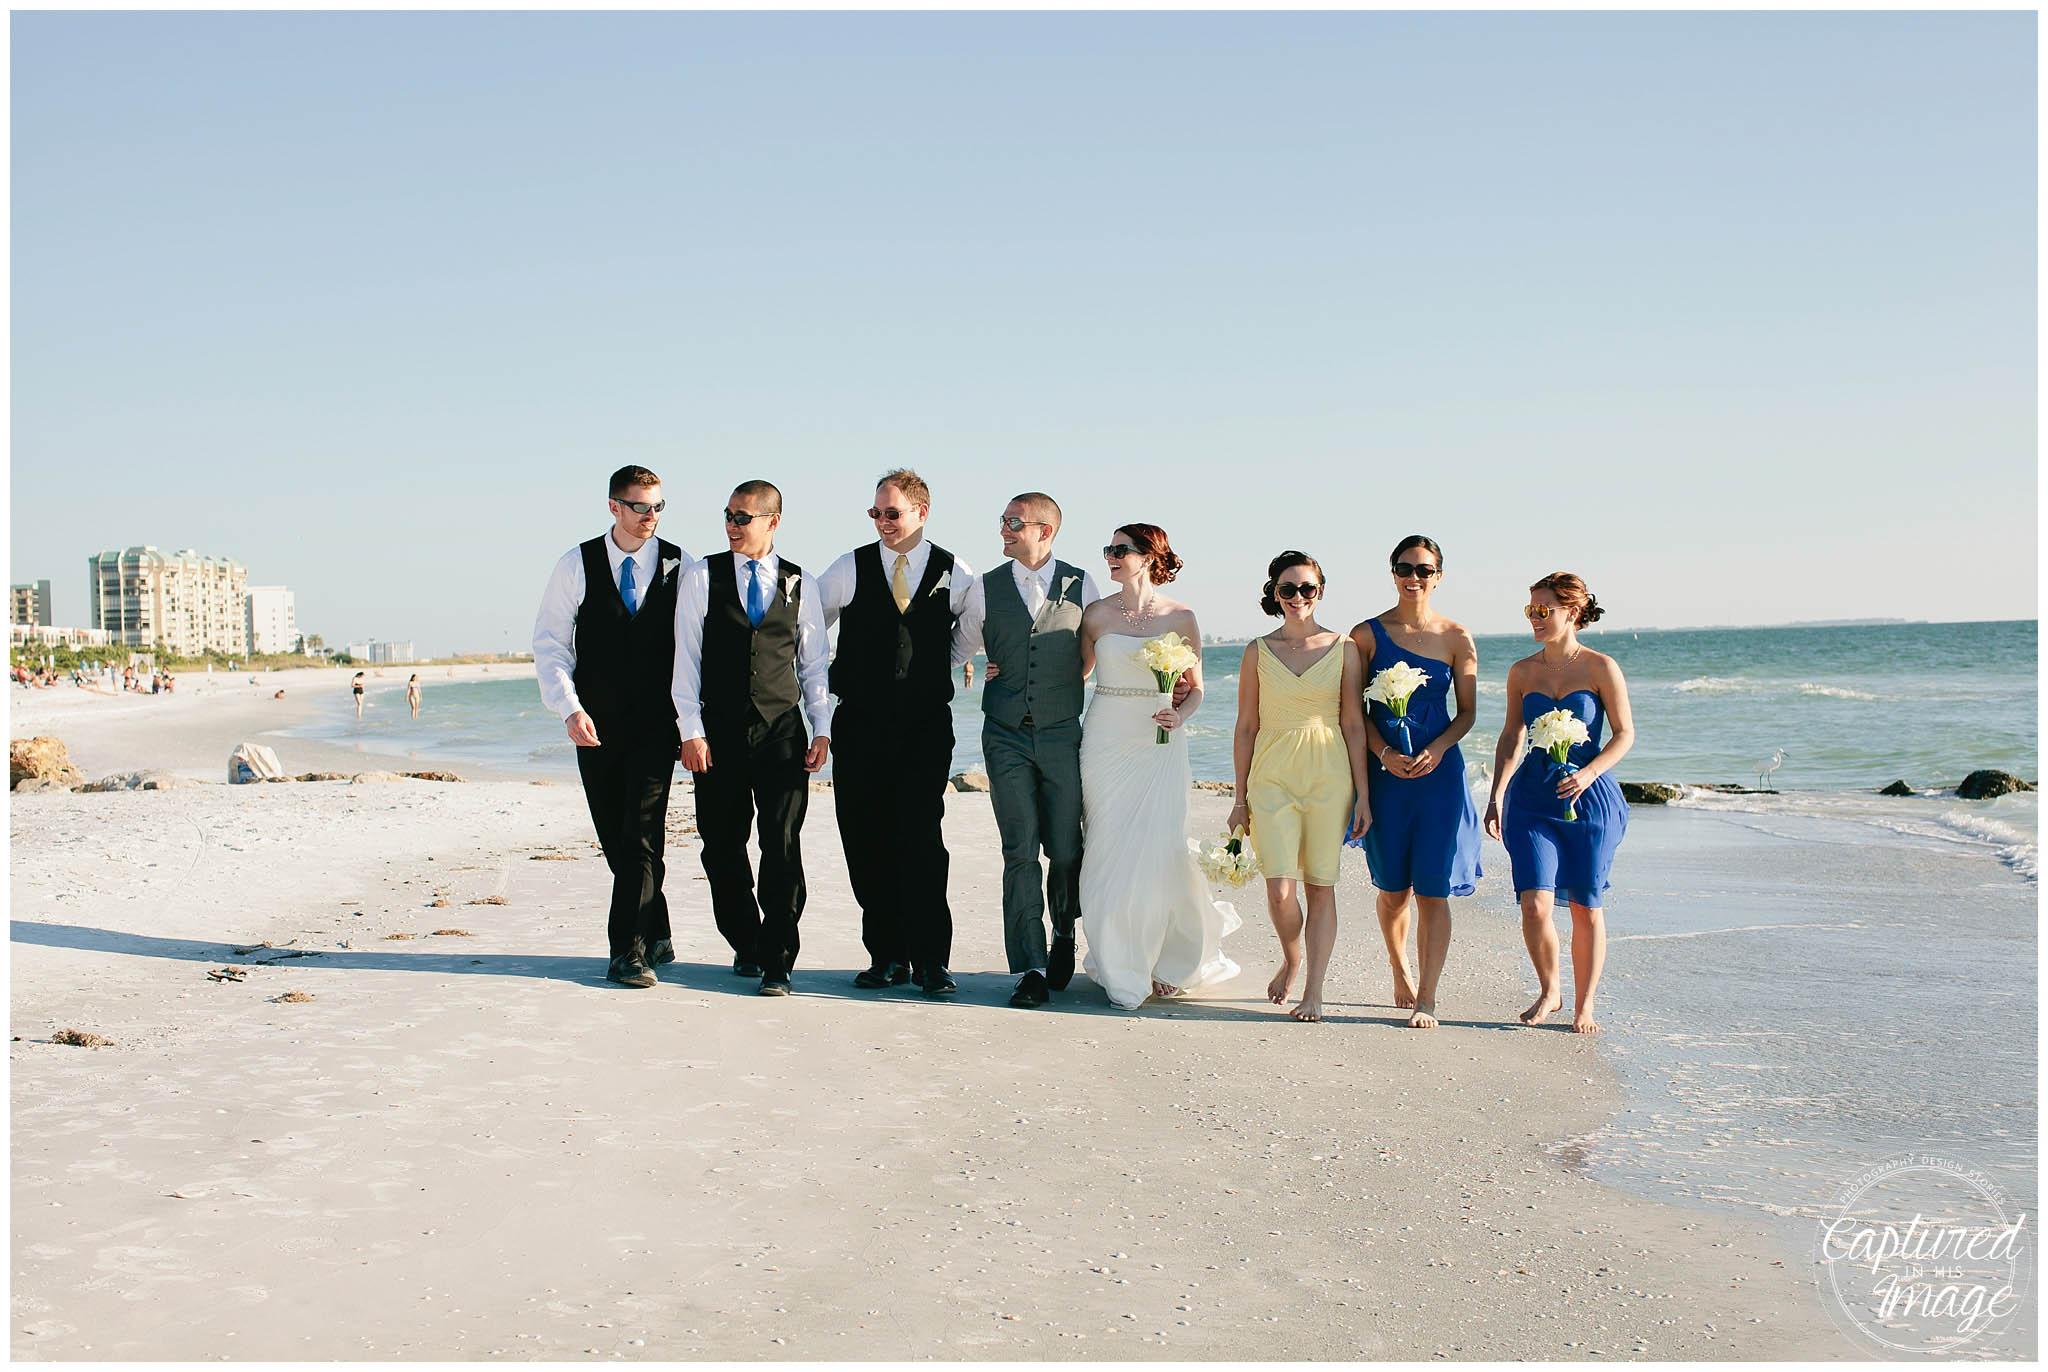 St. Pete Beach Destination Wedding (12 of 81)